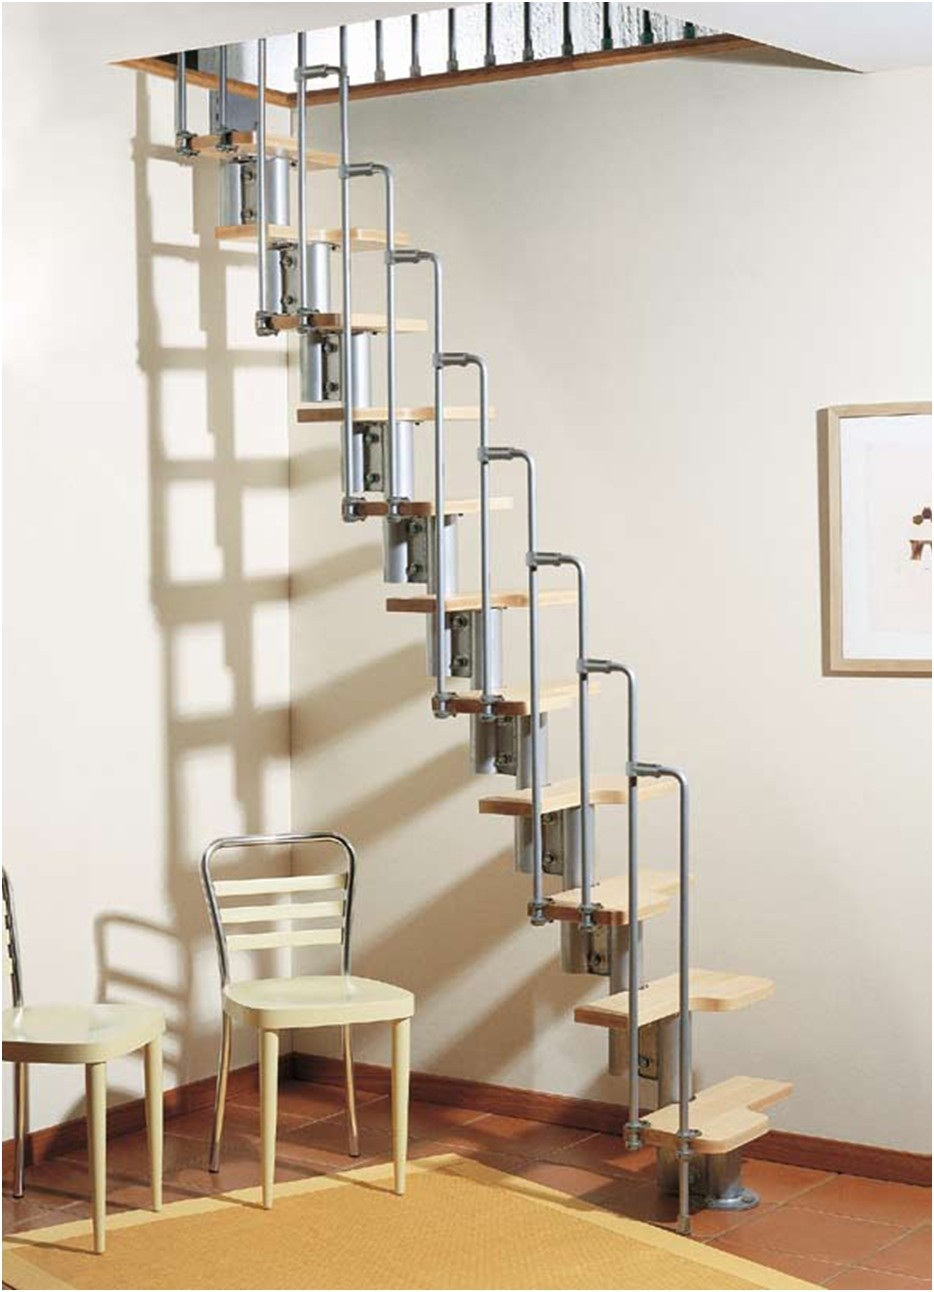 Karina Modular Staircase Kit Metal Steel And Wood Spiral | Metal Spiral Staircase Cost | Stair Case | Stair Treads | Iron | Stainless Steel | Deck